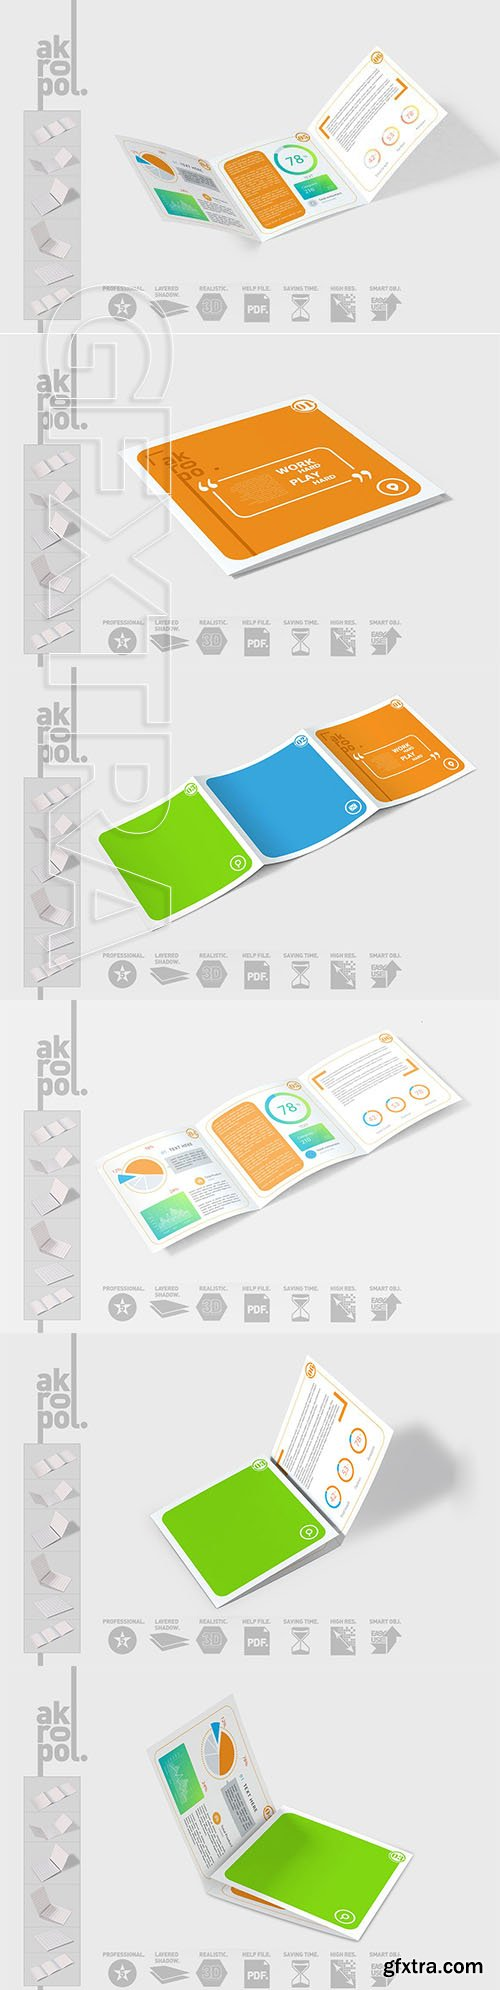 CreativeMarket - Square Trifold Brochure Mock-up 3054995